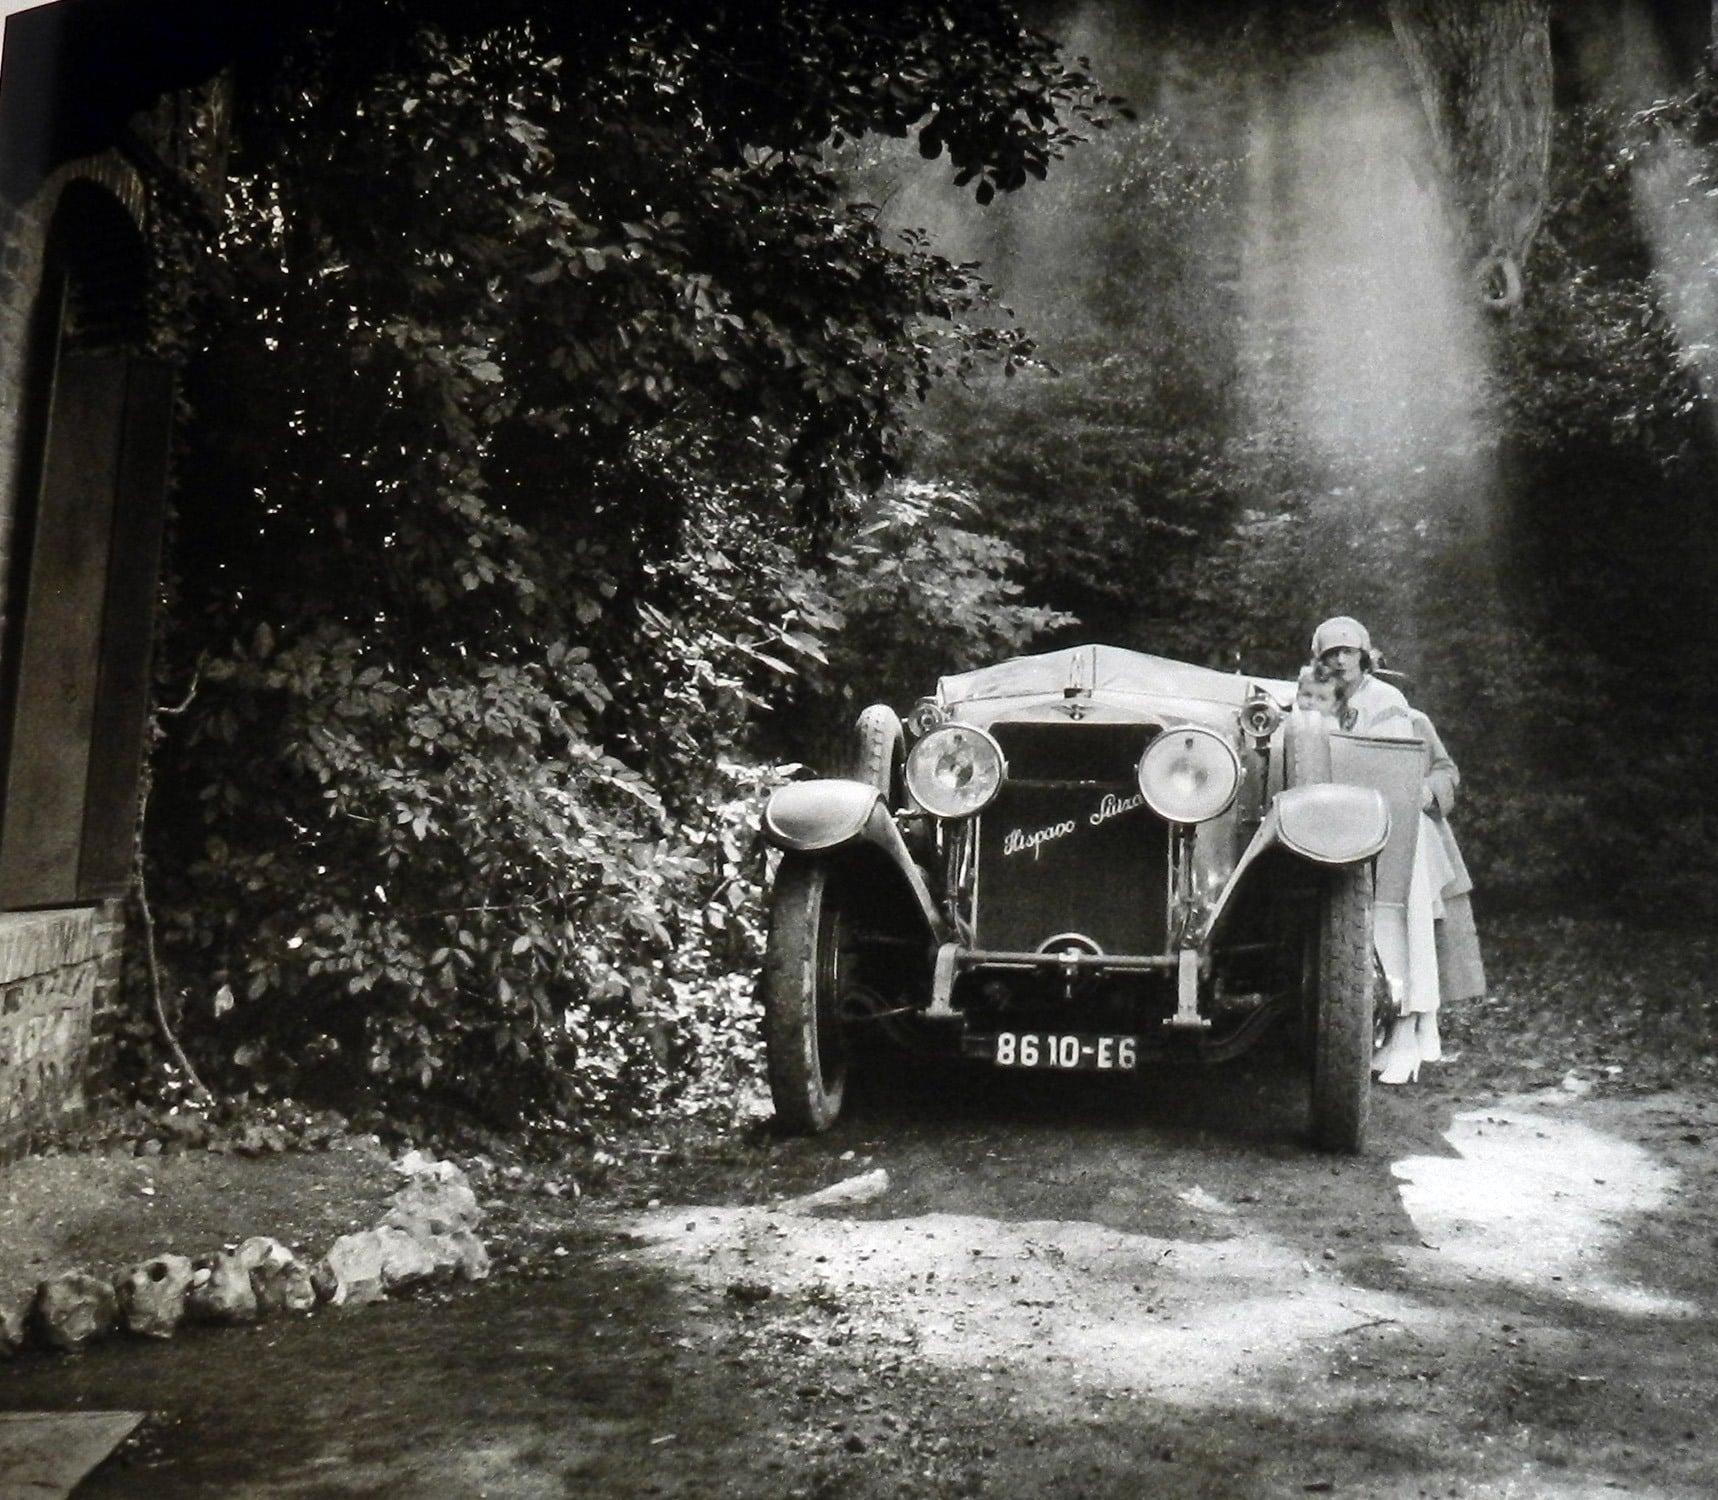 Hispano-Suiza-32-PK-Labourdette-1921-van-Papa-Lartigue-vader-van-de-fotograaf